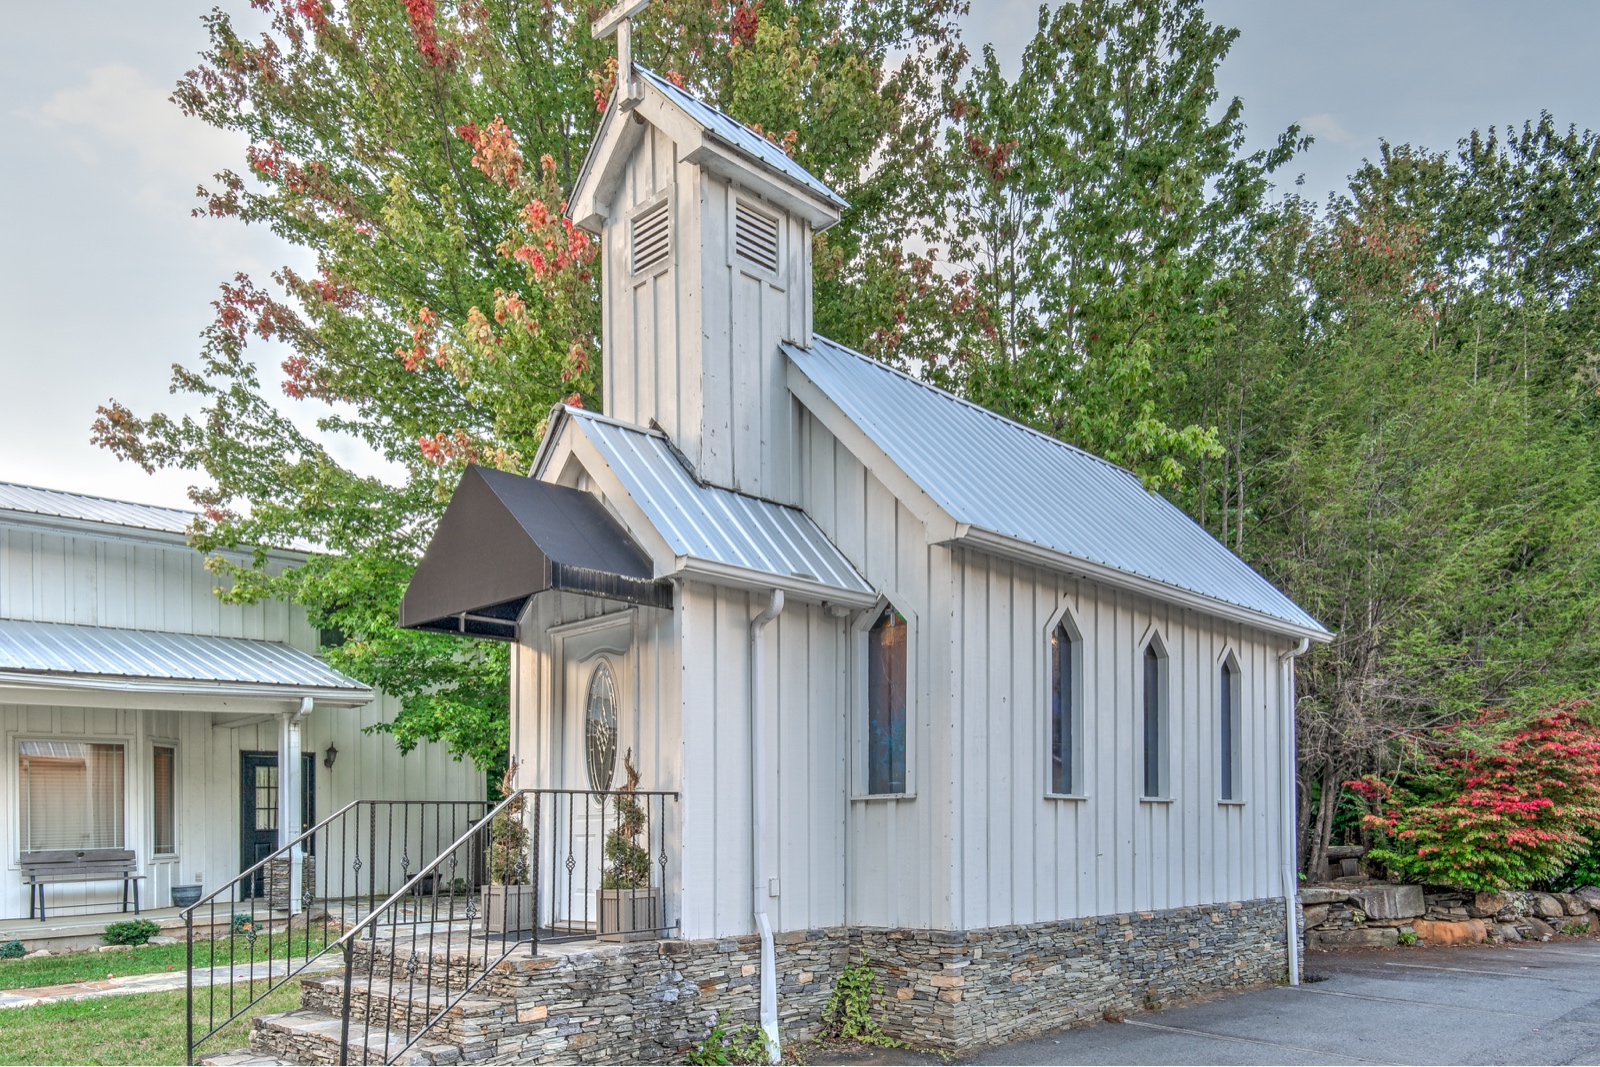 Miss Carolines Wedding Chapel – WNC Wedding/Elopement Destination